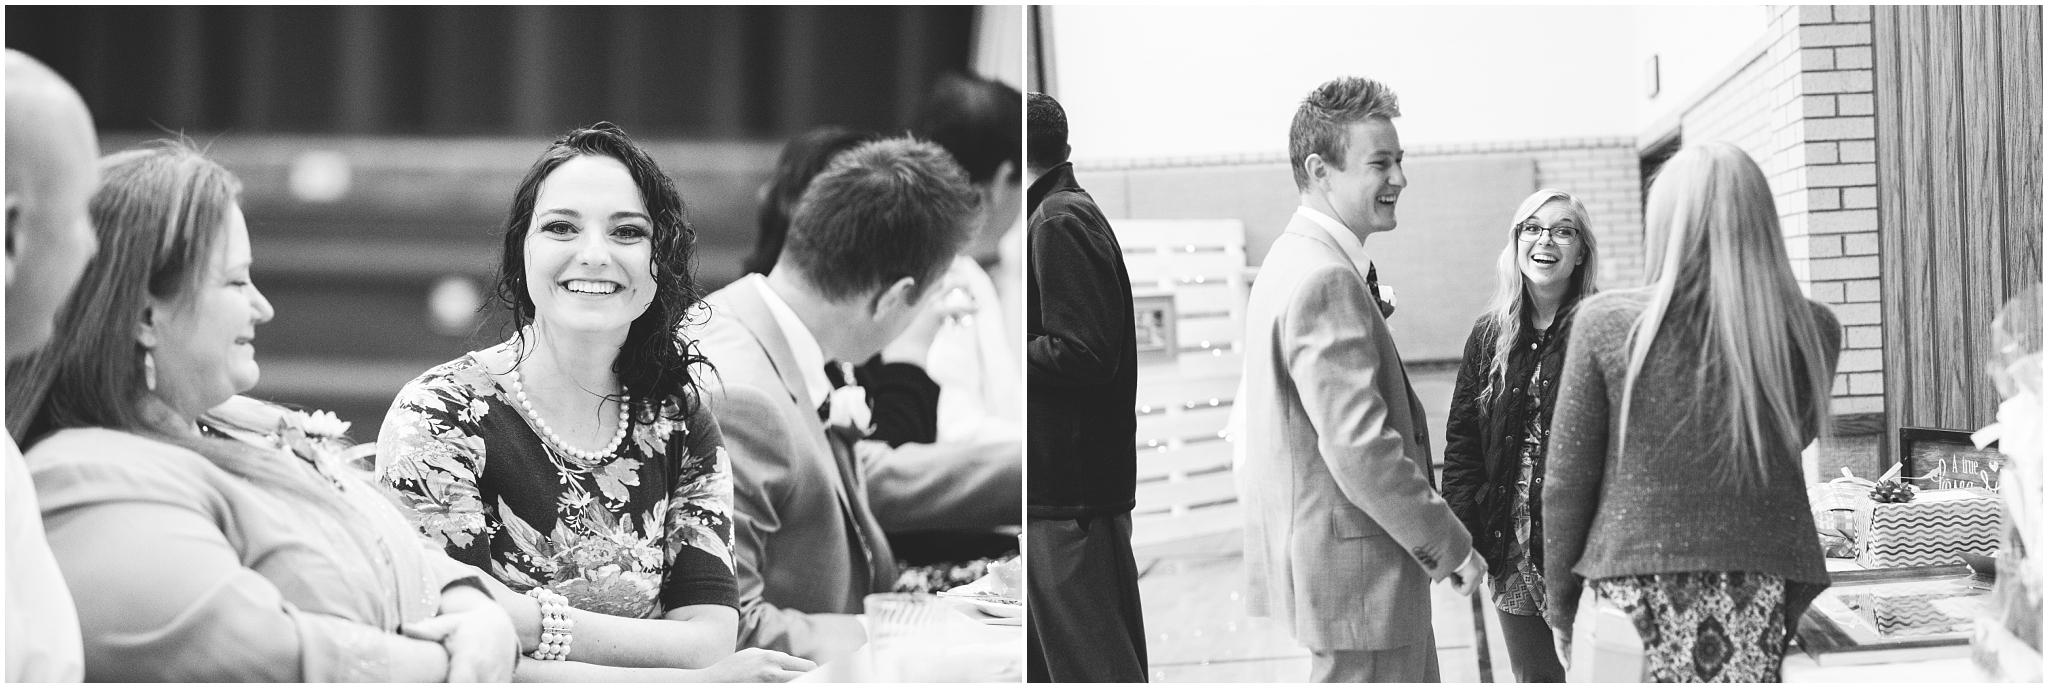 Bo Alyssa Wedding-240-BW_Lizzie-B-Imagery-Utah-Wedding-Photographer-Central-Utah-Photographer-Utah-County-Manti-Temple.jpg